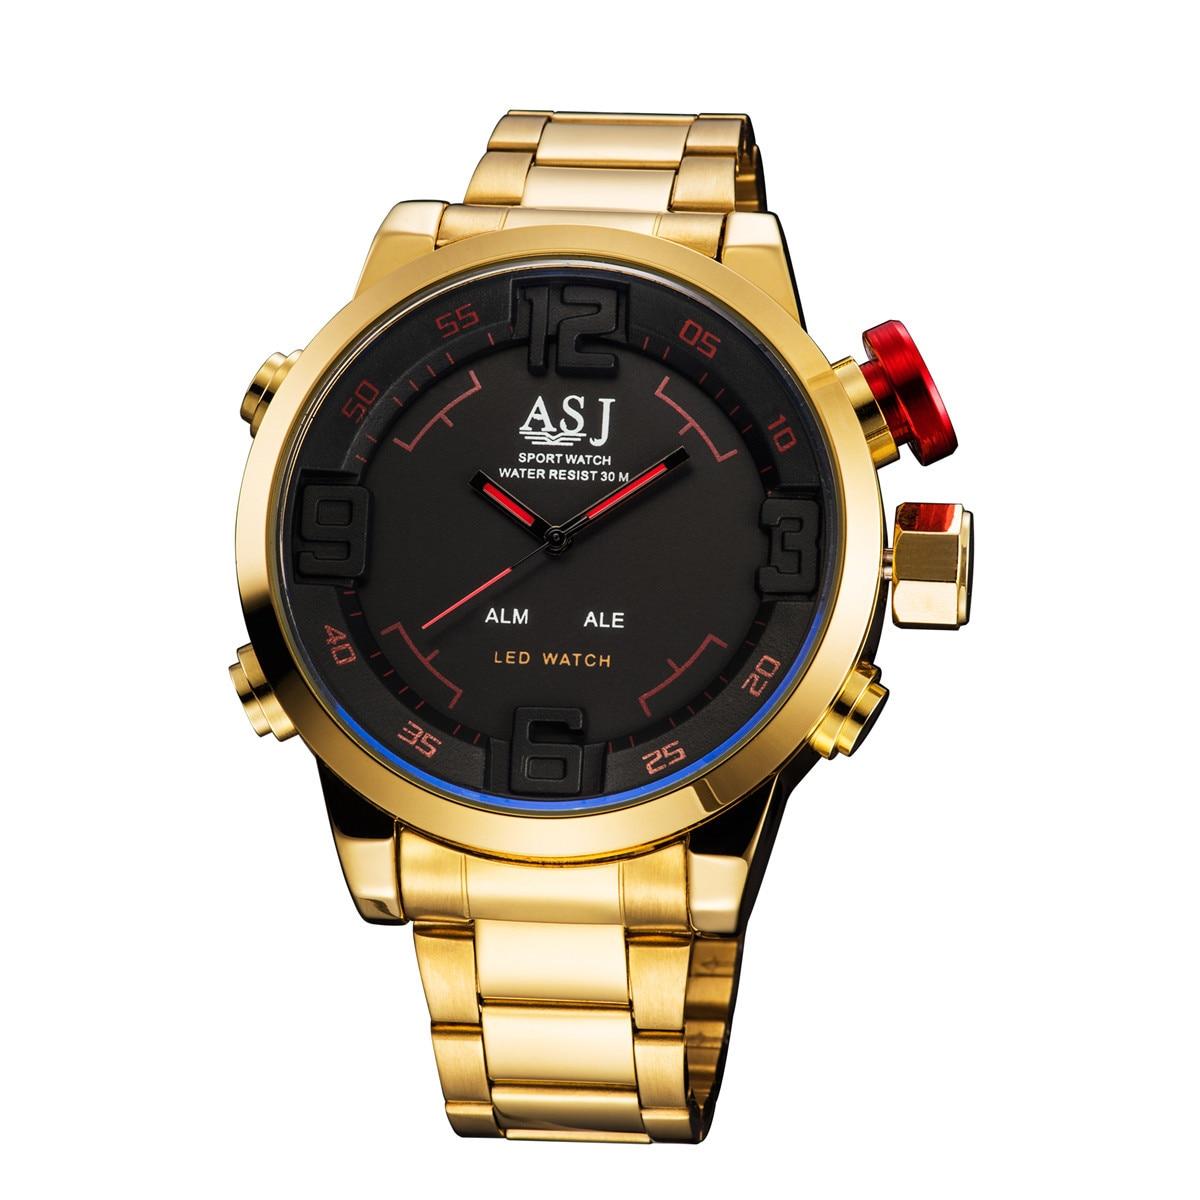 Relojes militares de marca ASJ para hombre relojes de pulsera deportivos con pantalla LED de cuarzo con correa de acero dorado de lujo para hombre 50 M impermeables